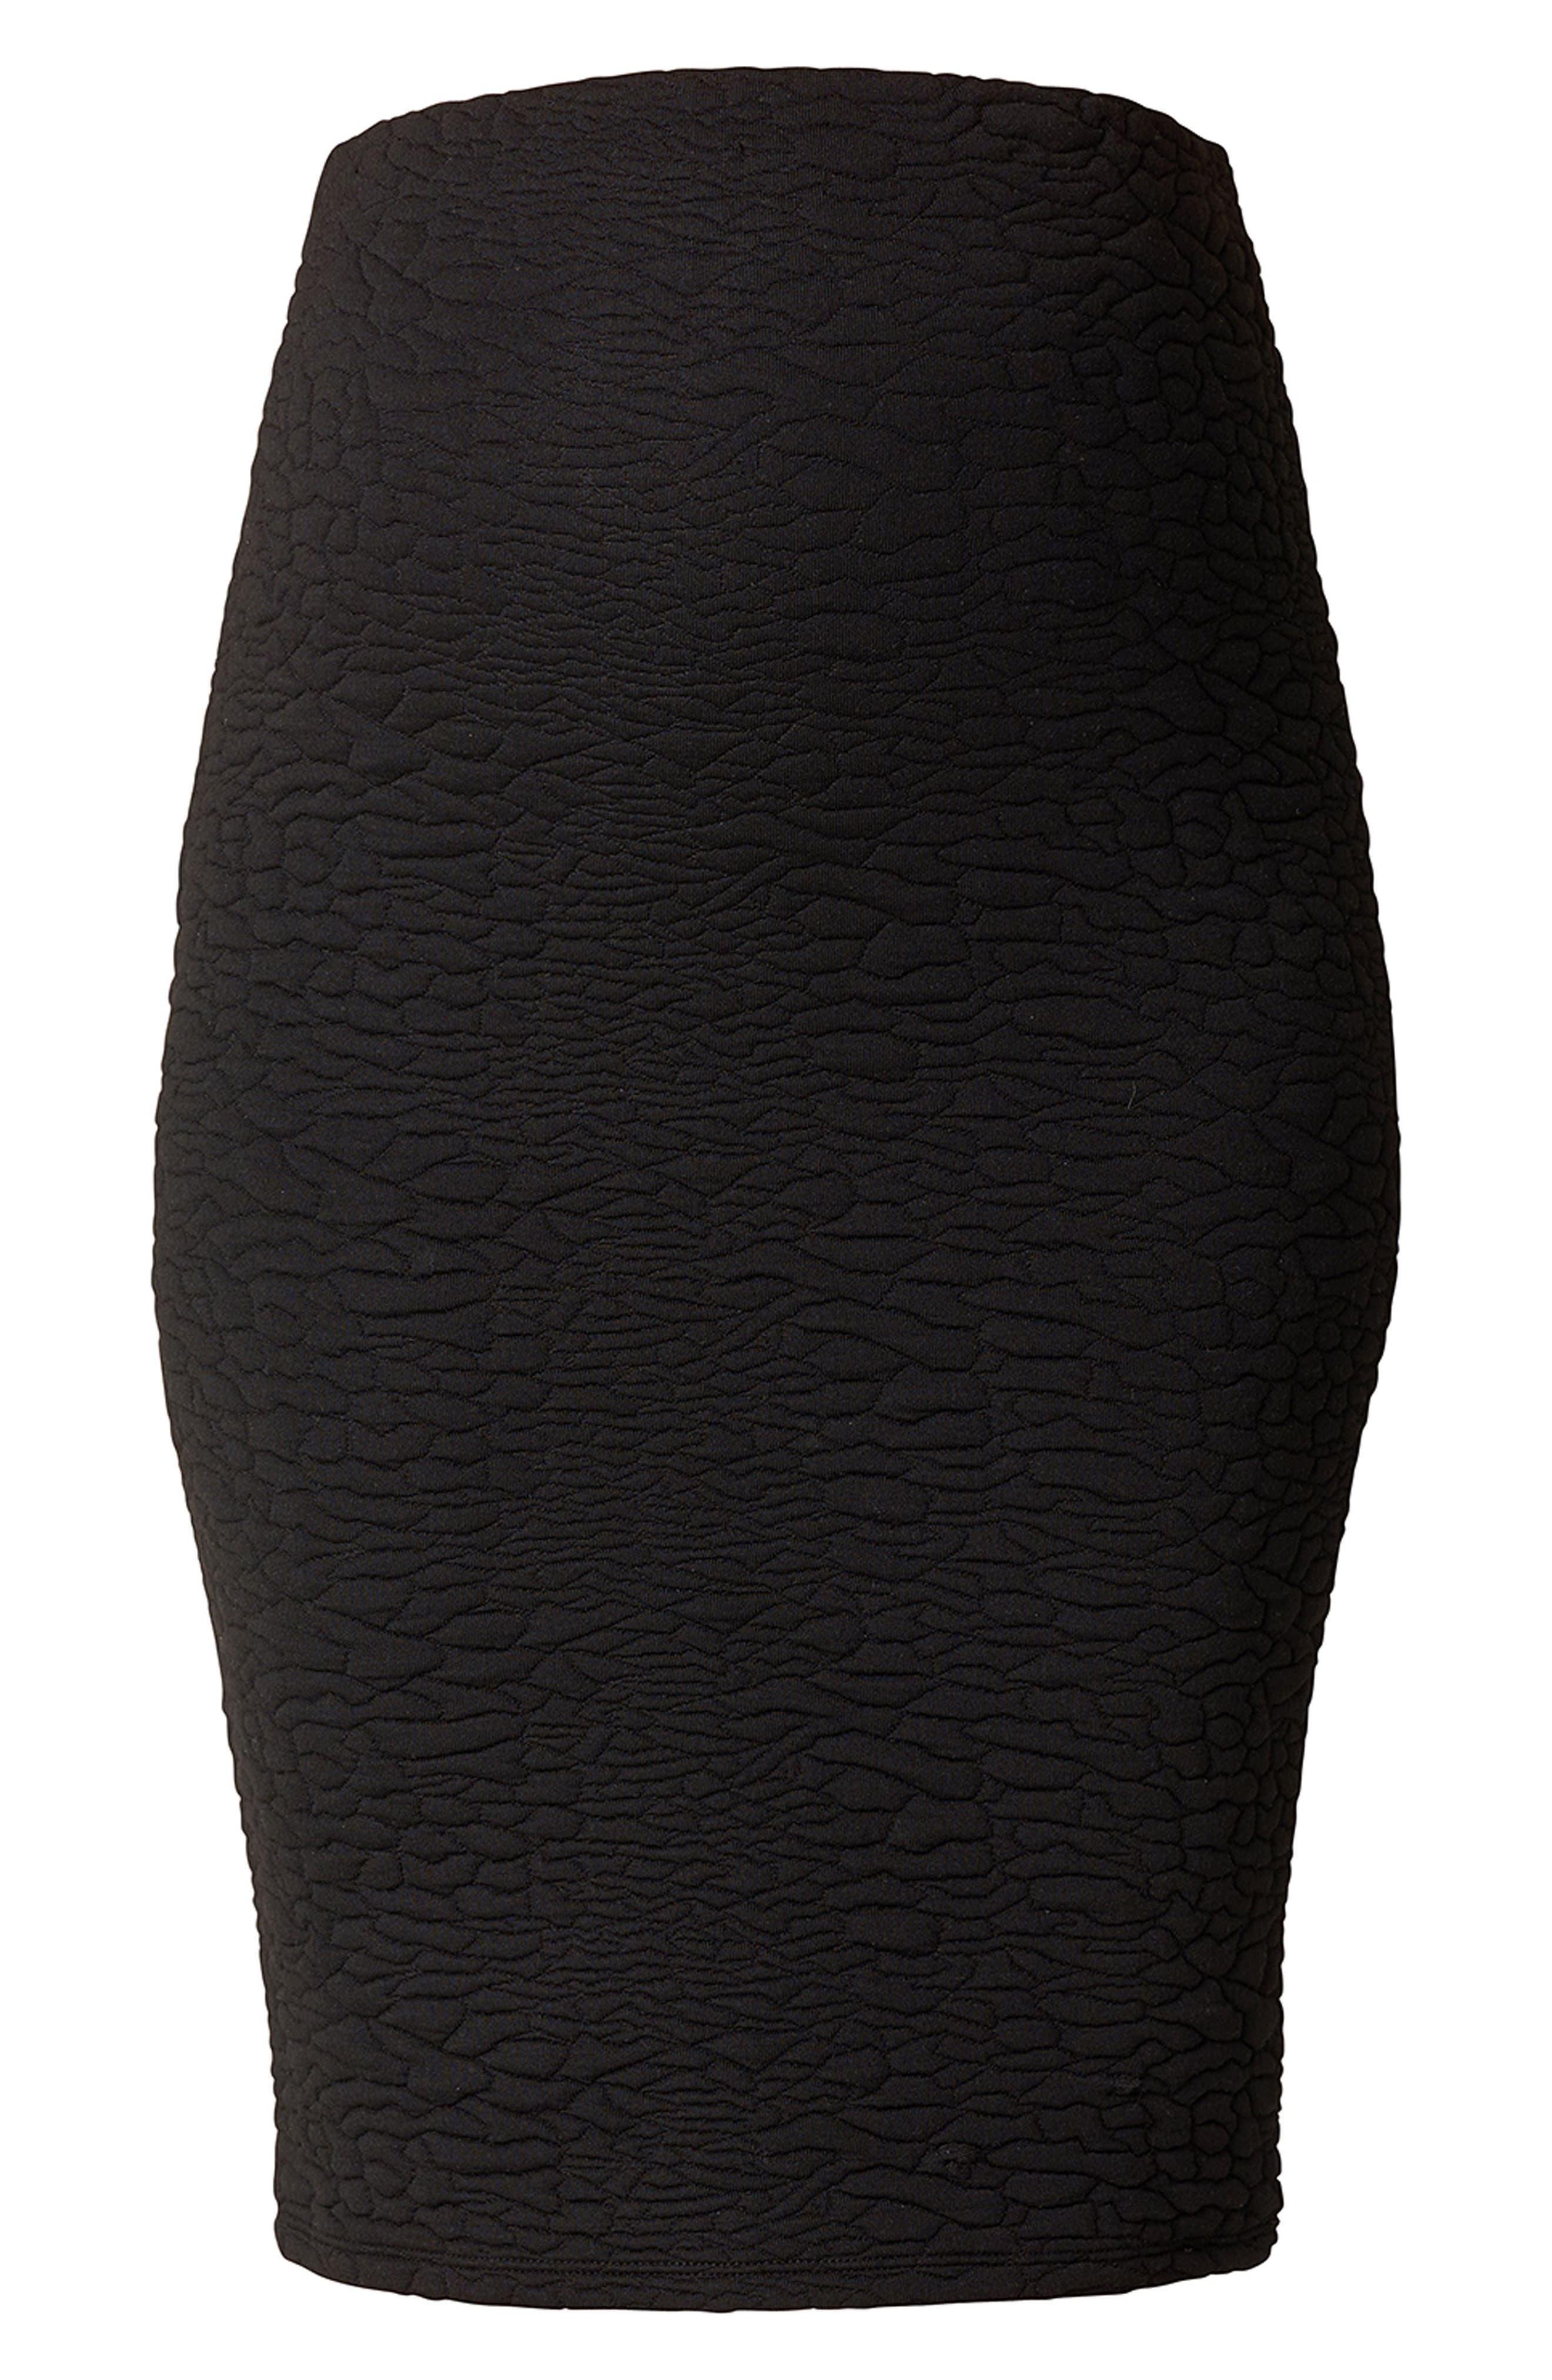 Jane Textured Knit Maternity Skirt,                             Main thumbnail 1, color,                             BLACK